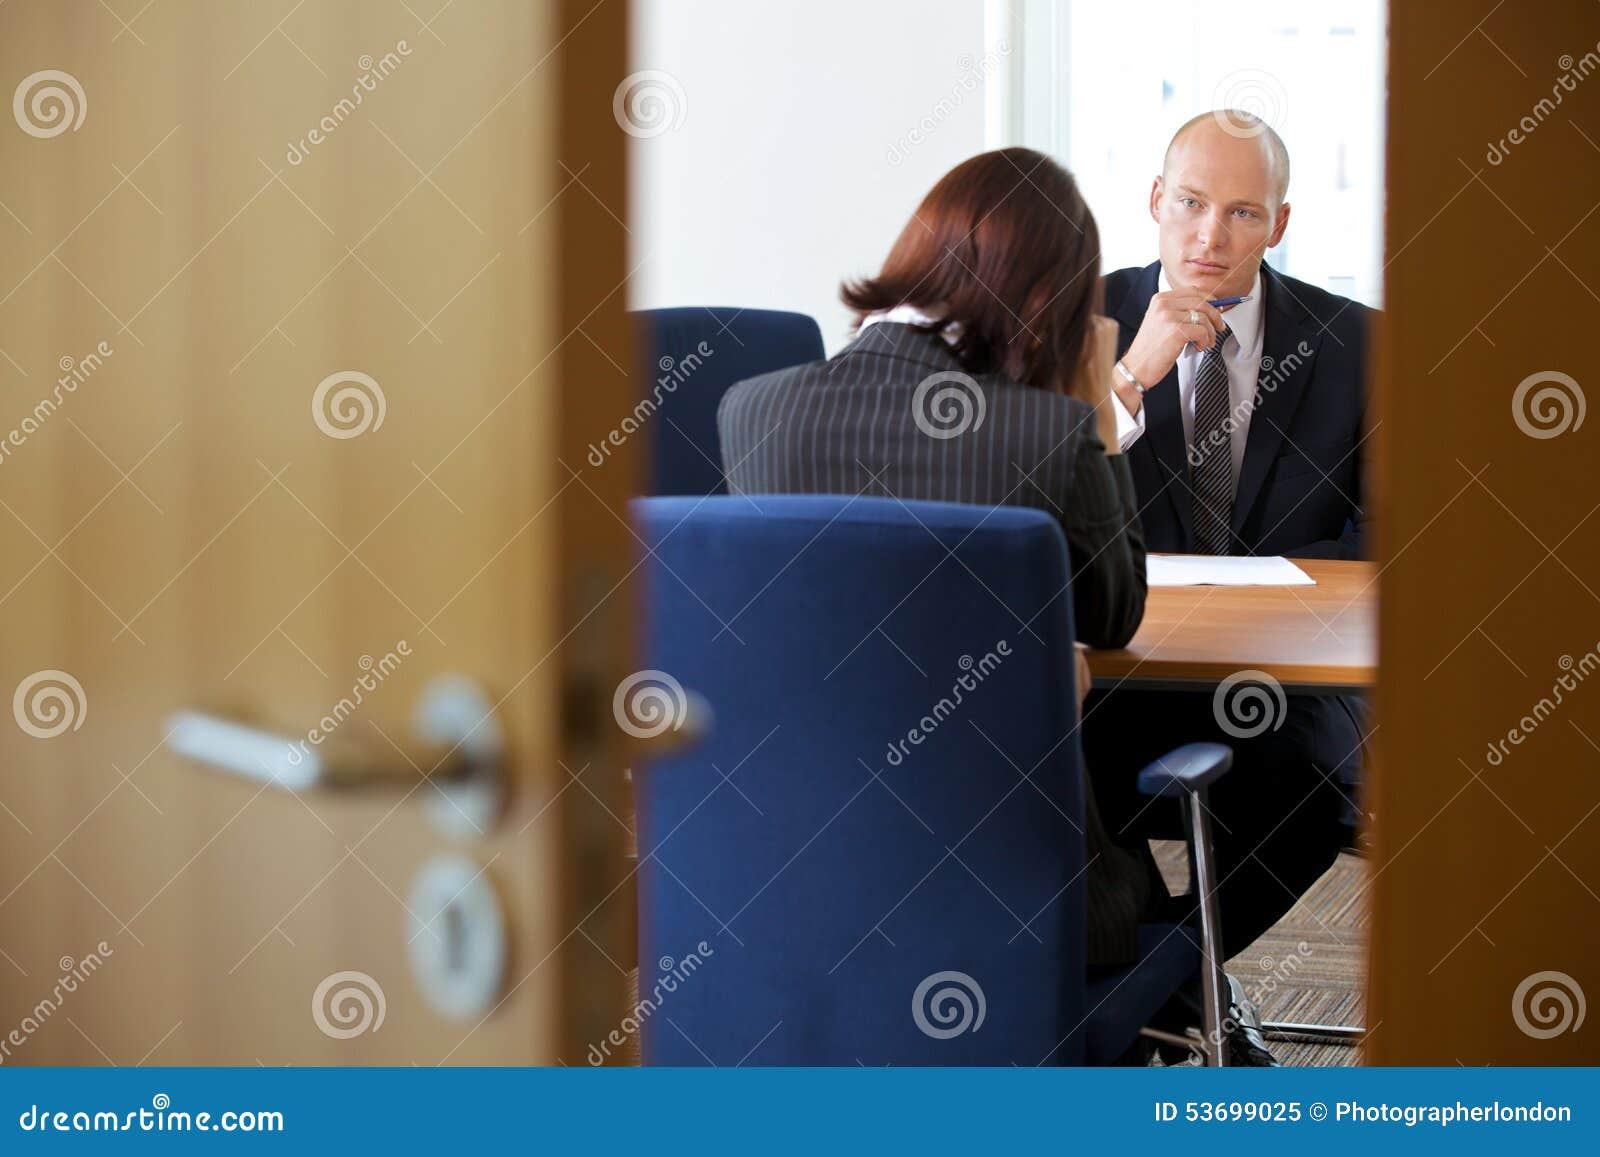 Zakenman in bespreking met onderneemster